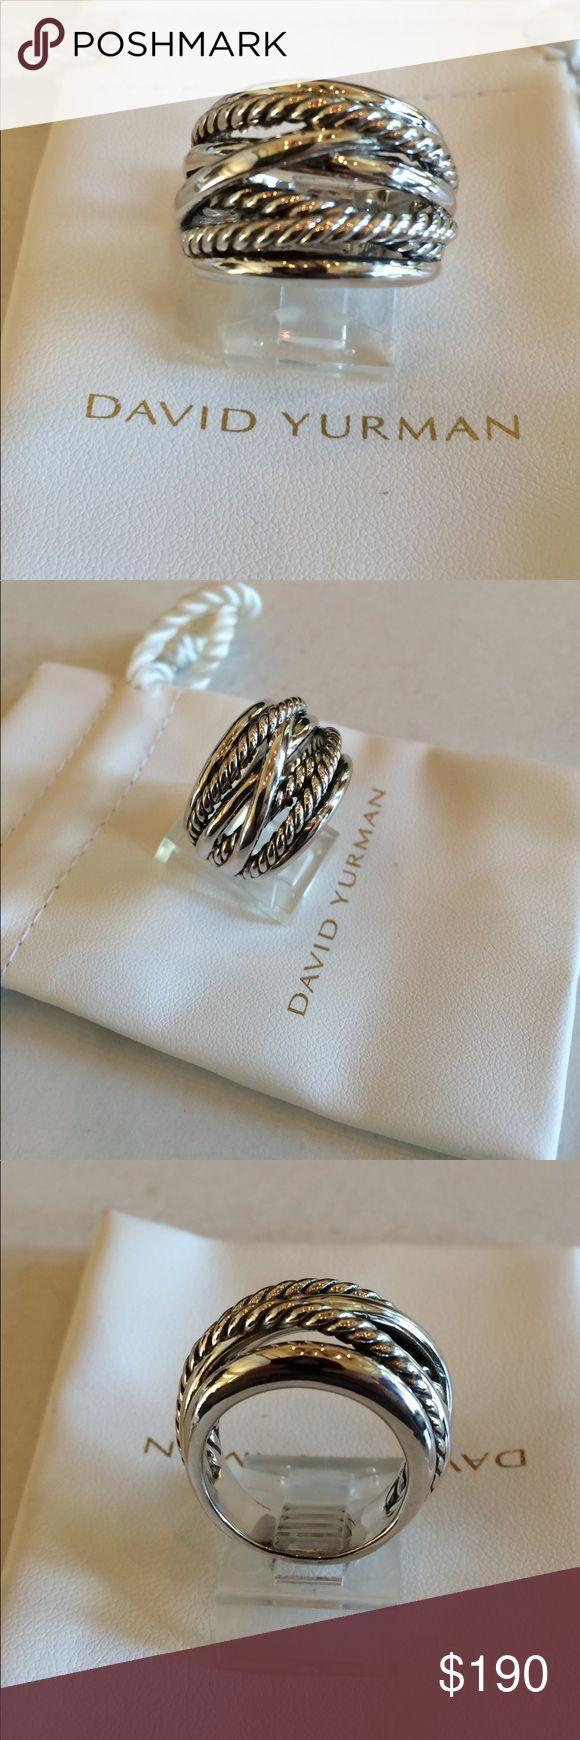 Best 25 copyright symbol ideas on pinterest symbol drawing david yurman new crossover sterling silver ring 8 biocorpaavc